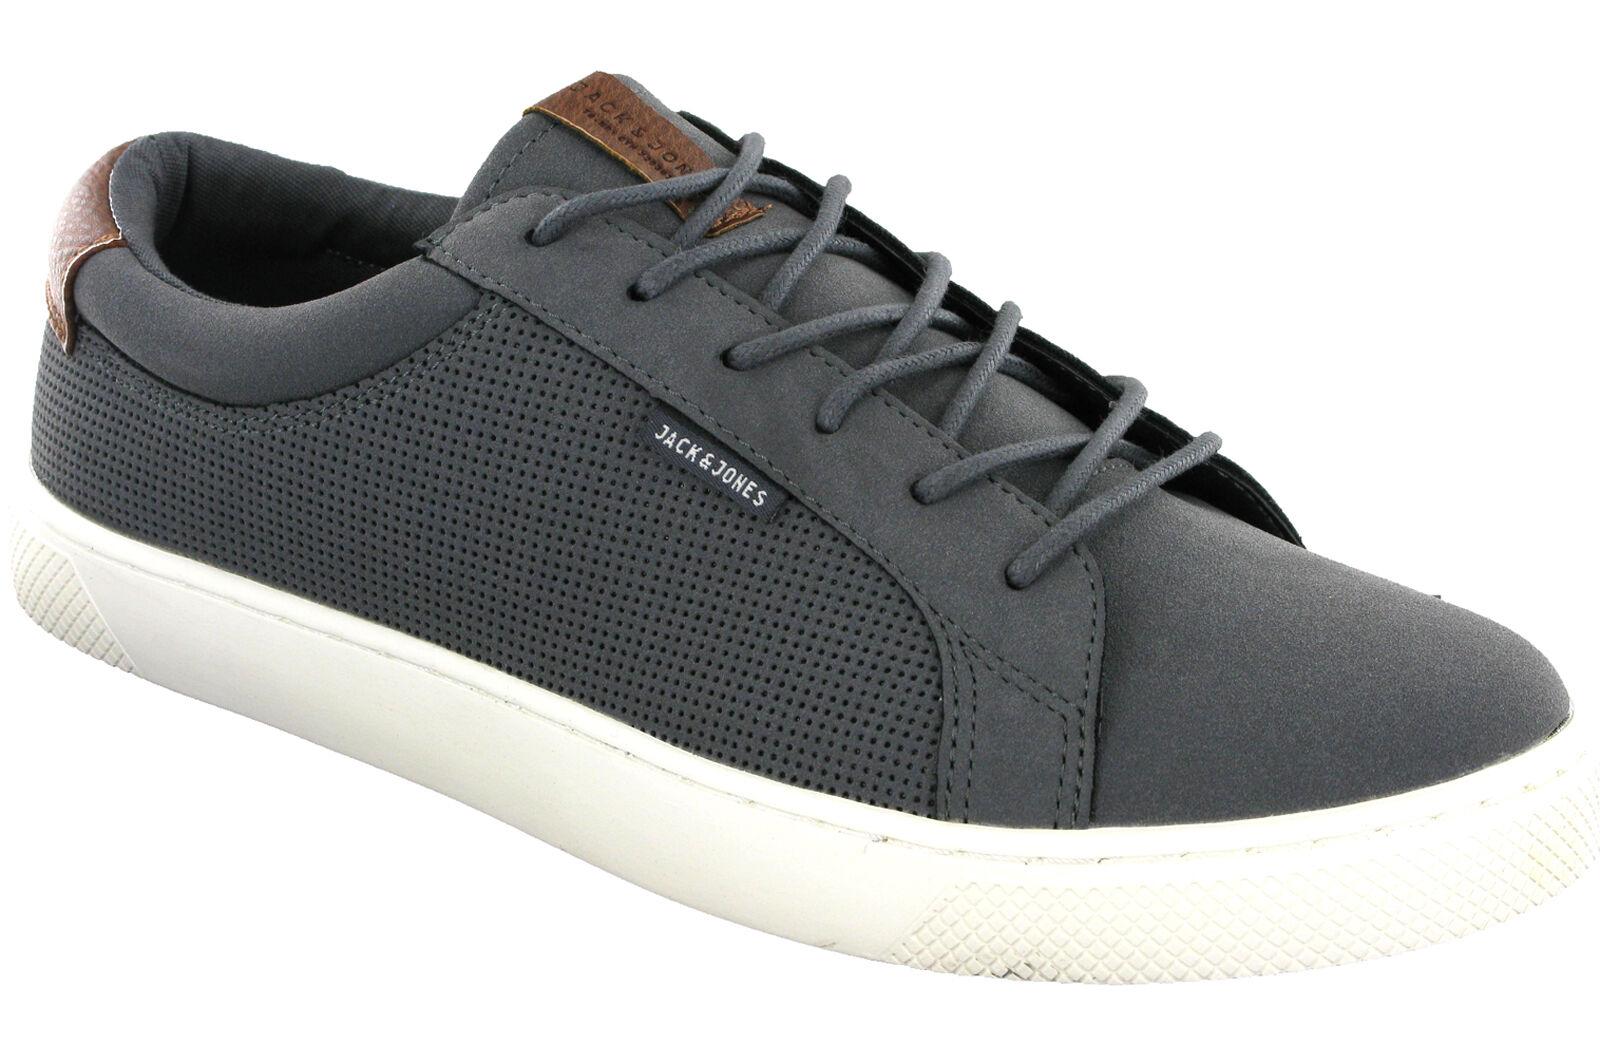 Jack & Jones Zobel Turnschuhe Herren Grau Mode Flach Schnürschuhe Sneakers